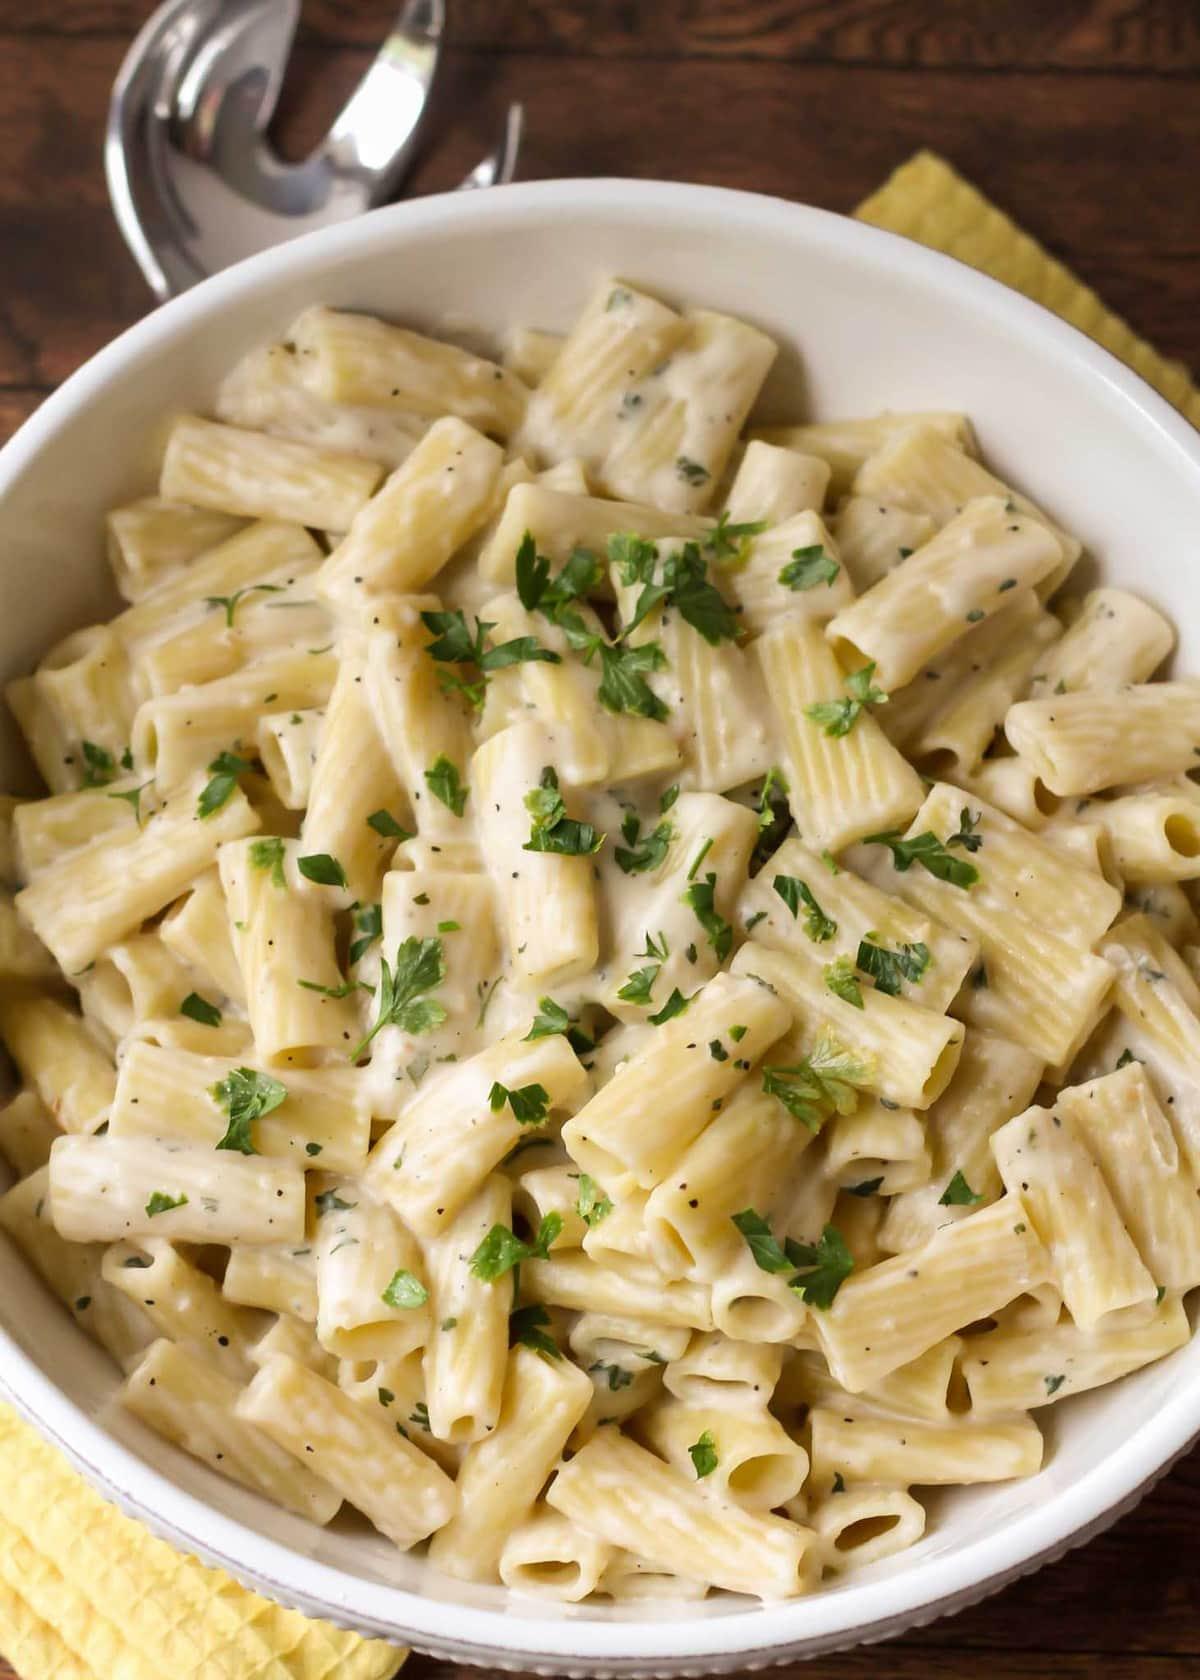 Creamy White Sauce Penne Pasta